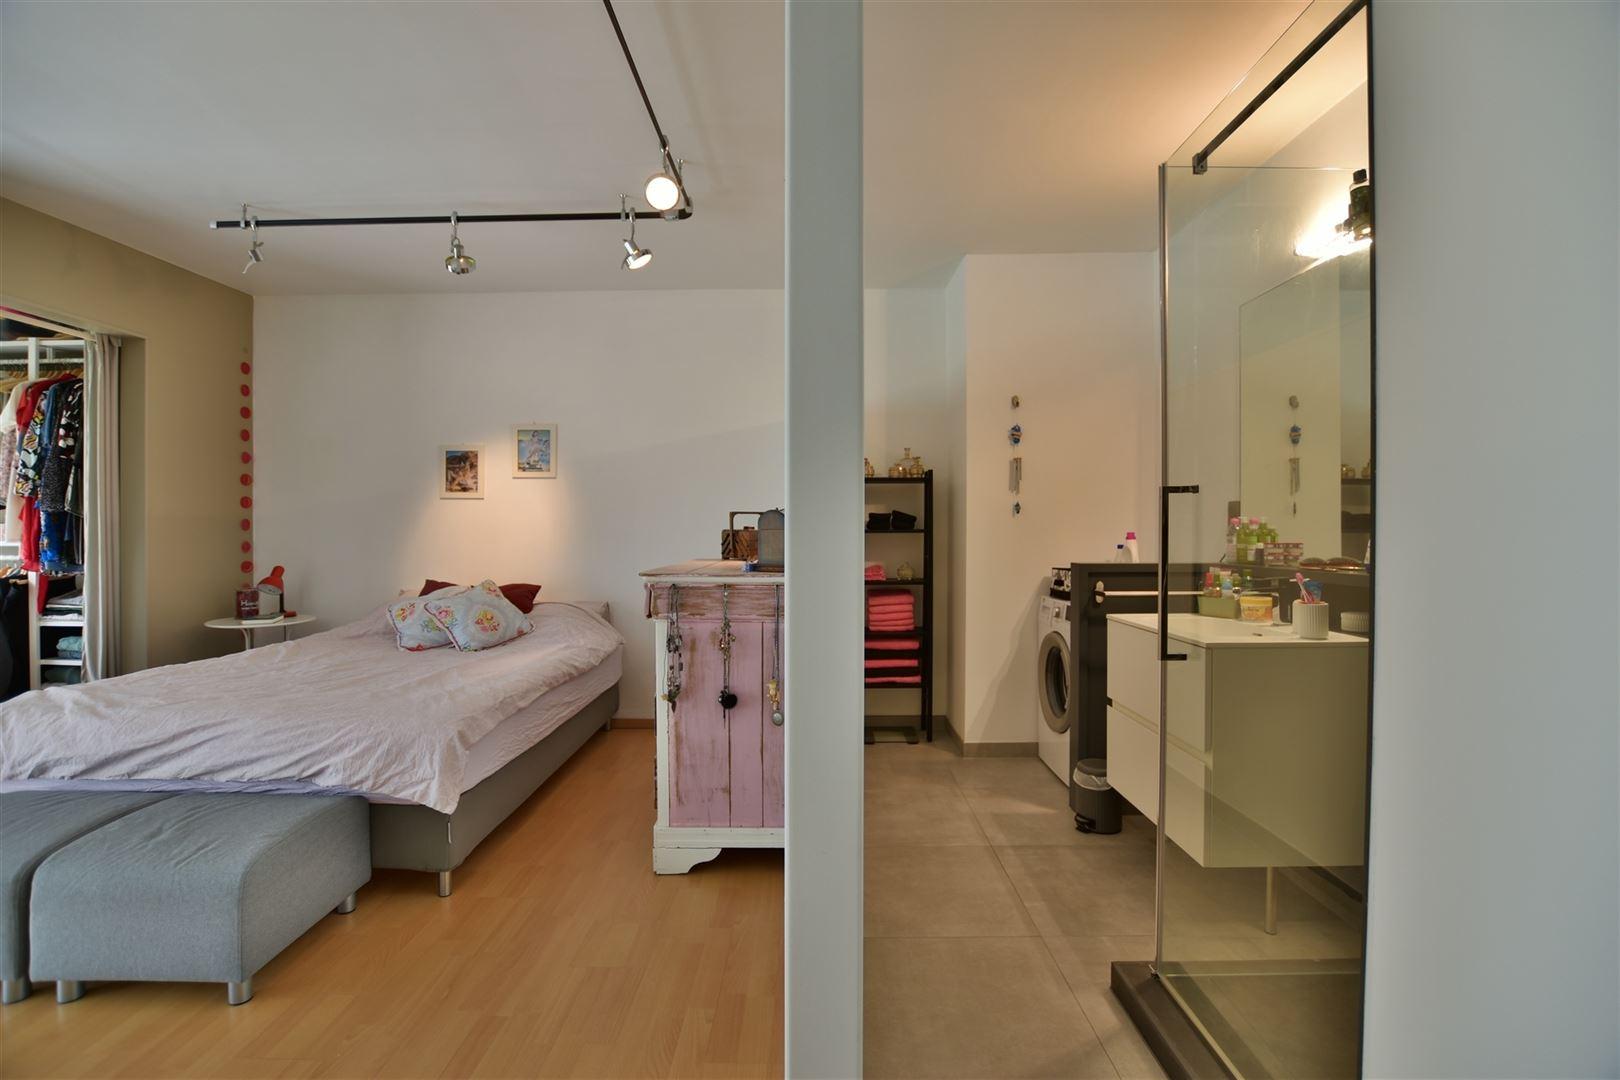 Foto 11 : Appartement te 9200 DENDERMONDE (België) - Prijs € 199.000